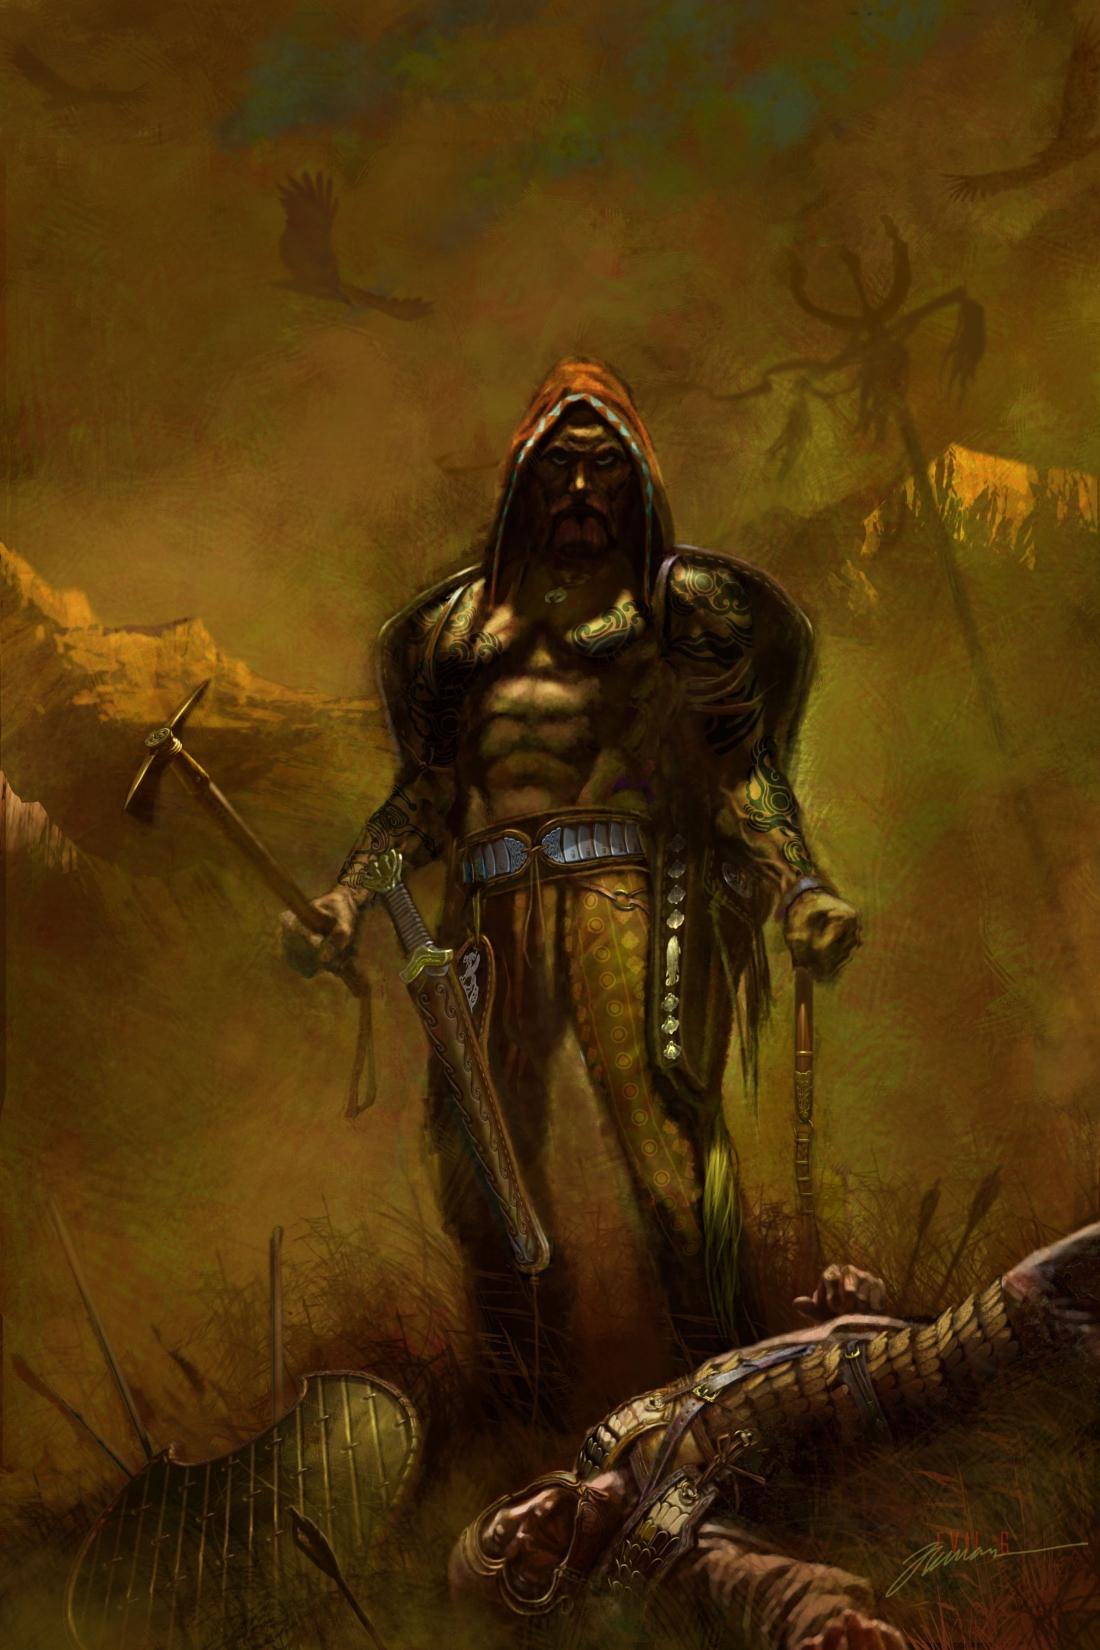 Gary_Freeman_illustration-Scythian-2c